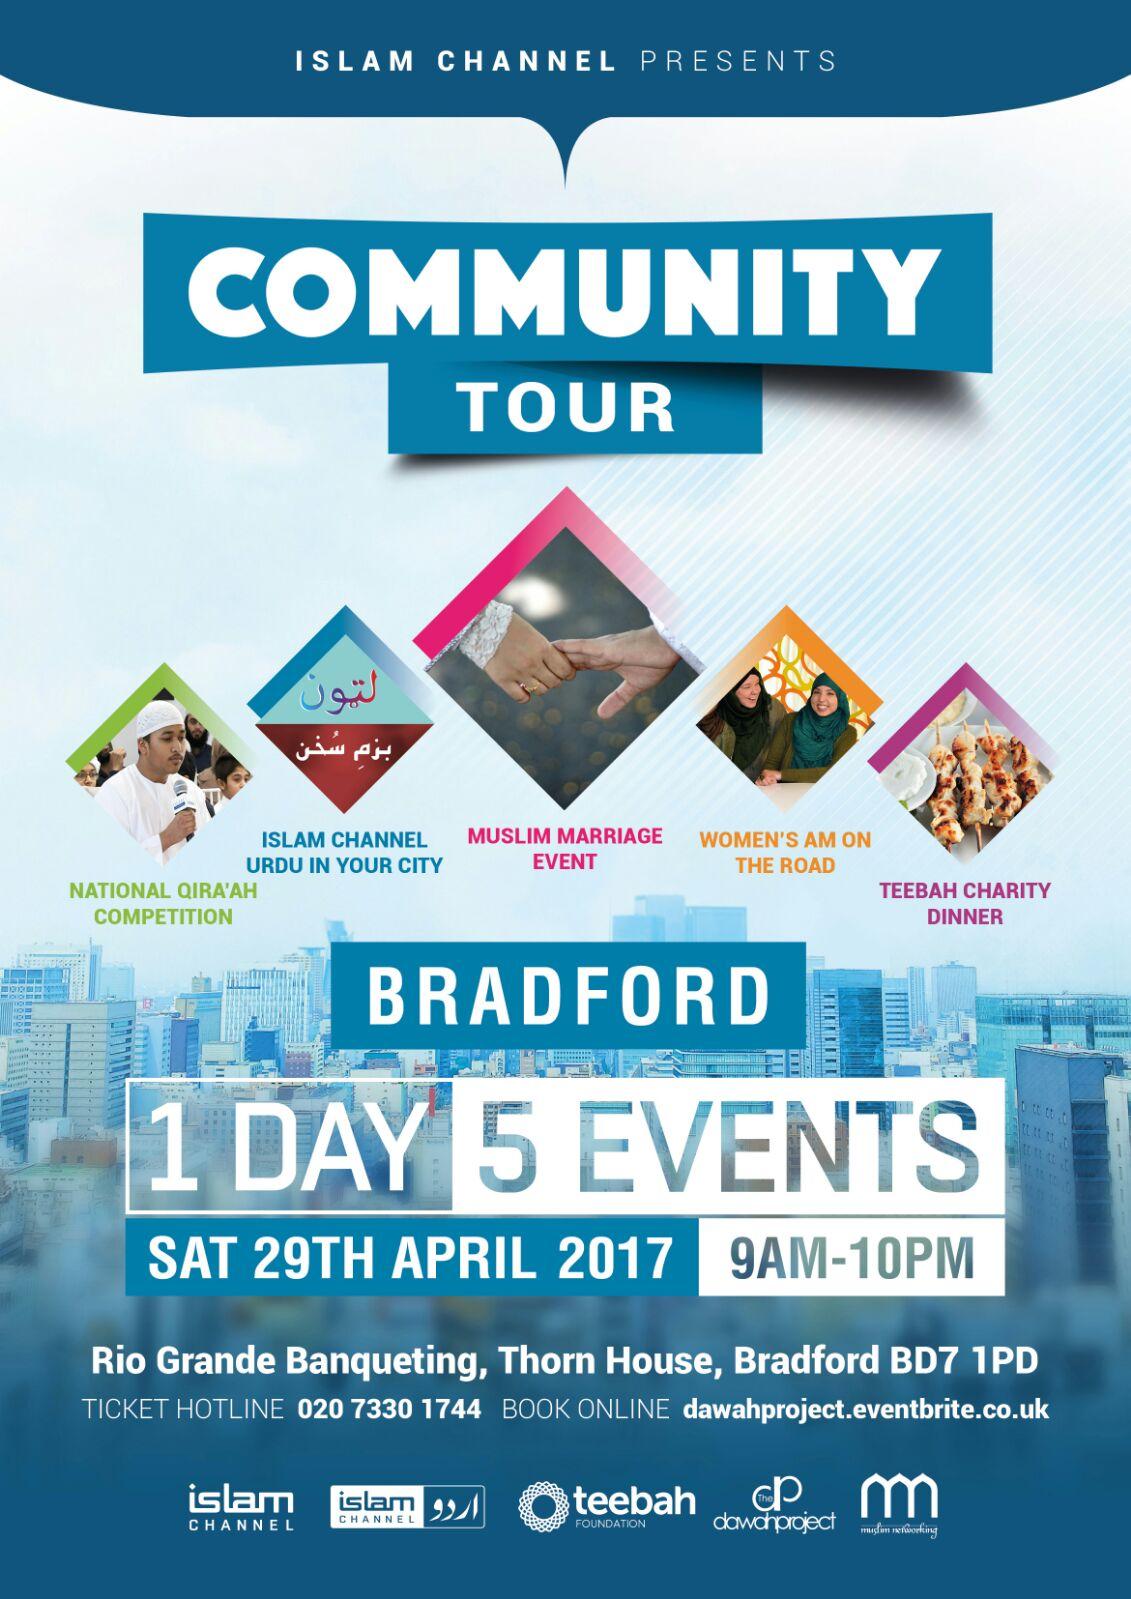 ISLAM CHANNEL COMMUNITY TOUR BRADFORD